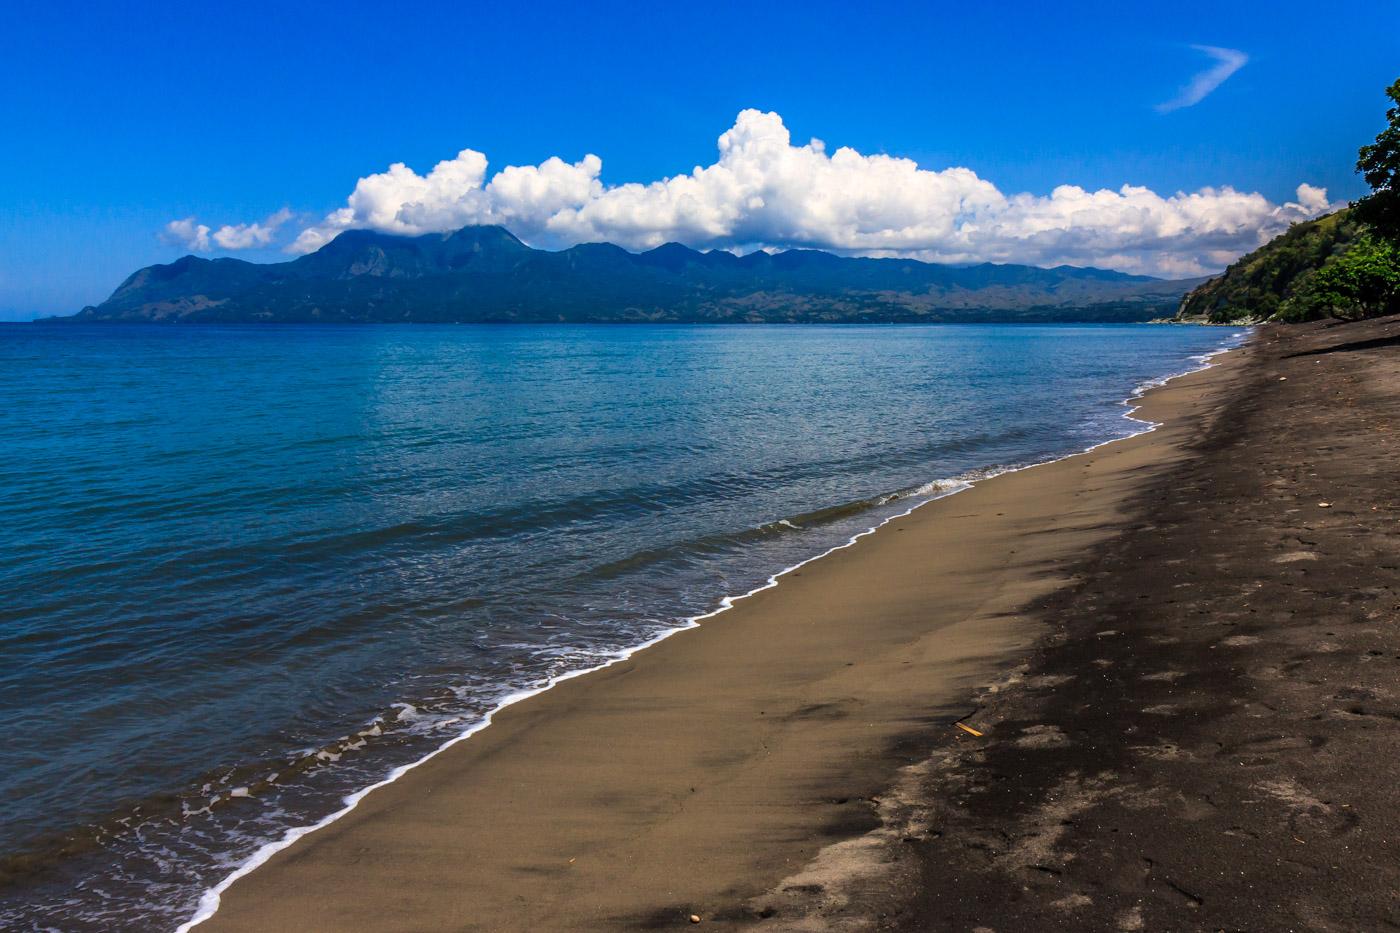 Deserted black sand beach.